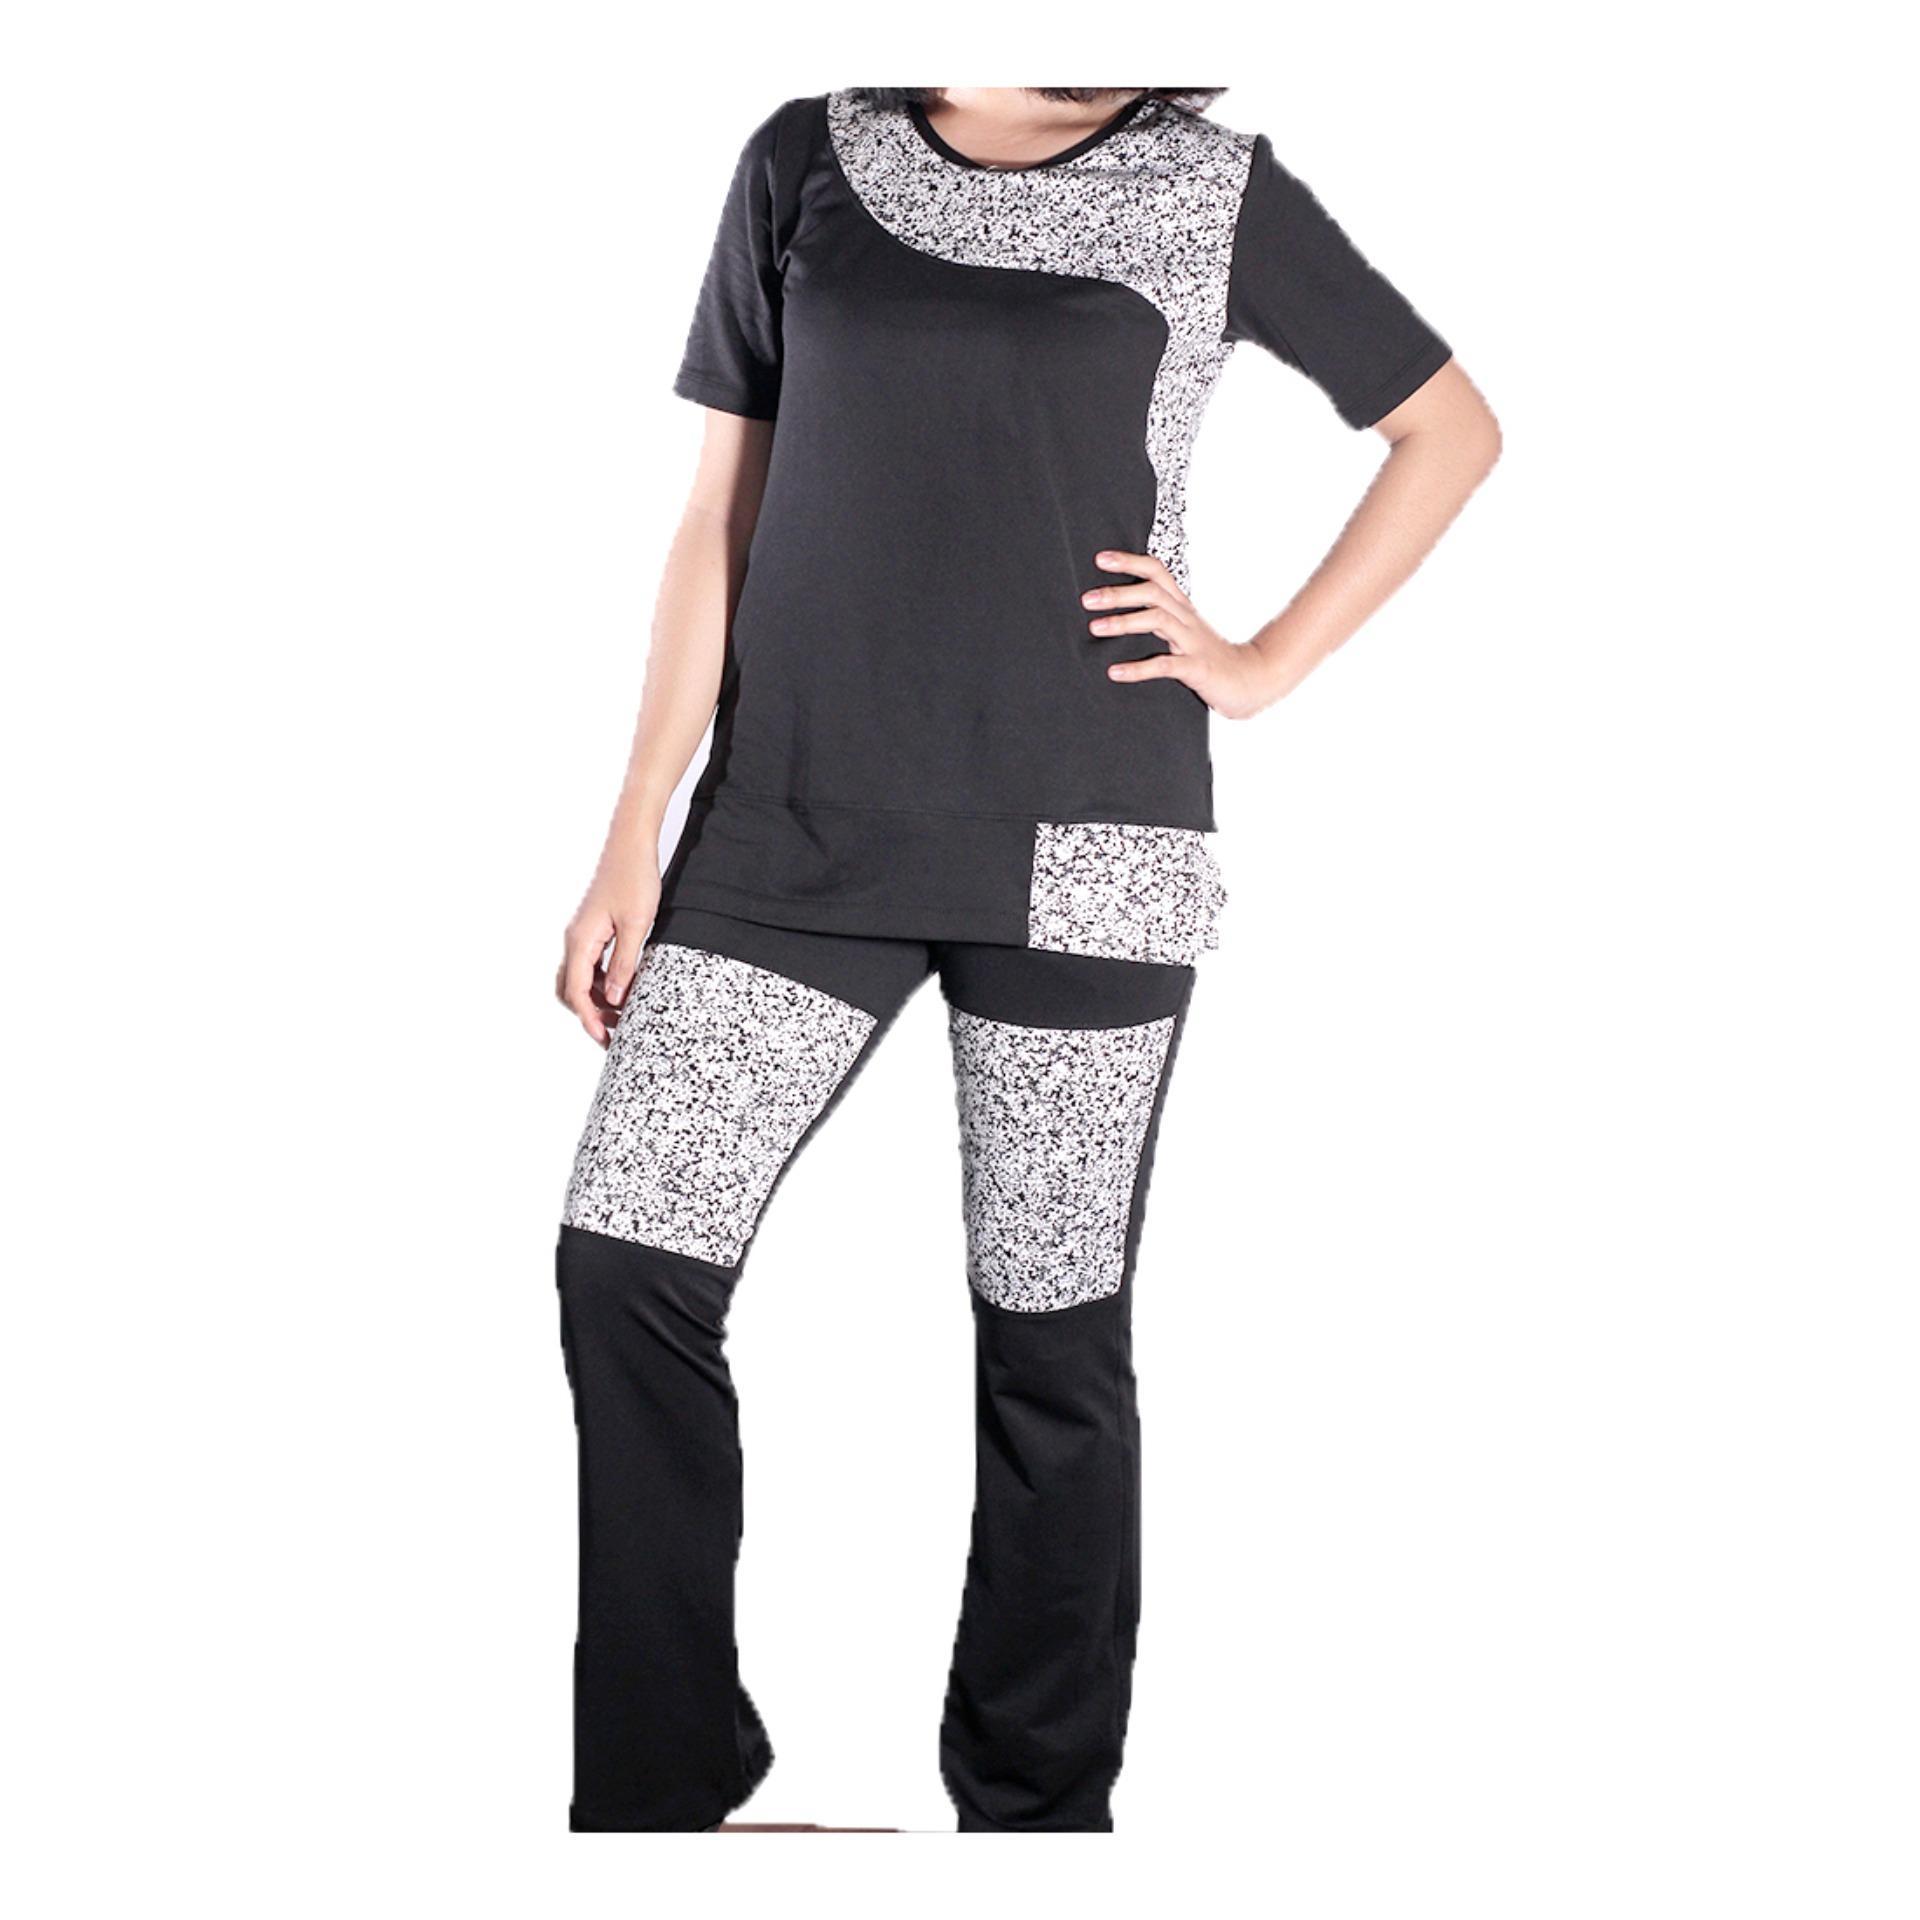 Mall BTM Fashion - Diana Pakaian Senam Wanita Model Atasan Dan Bawahan Panjang Harga Murah - Hitam